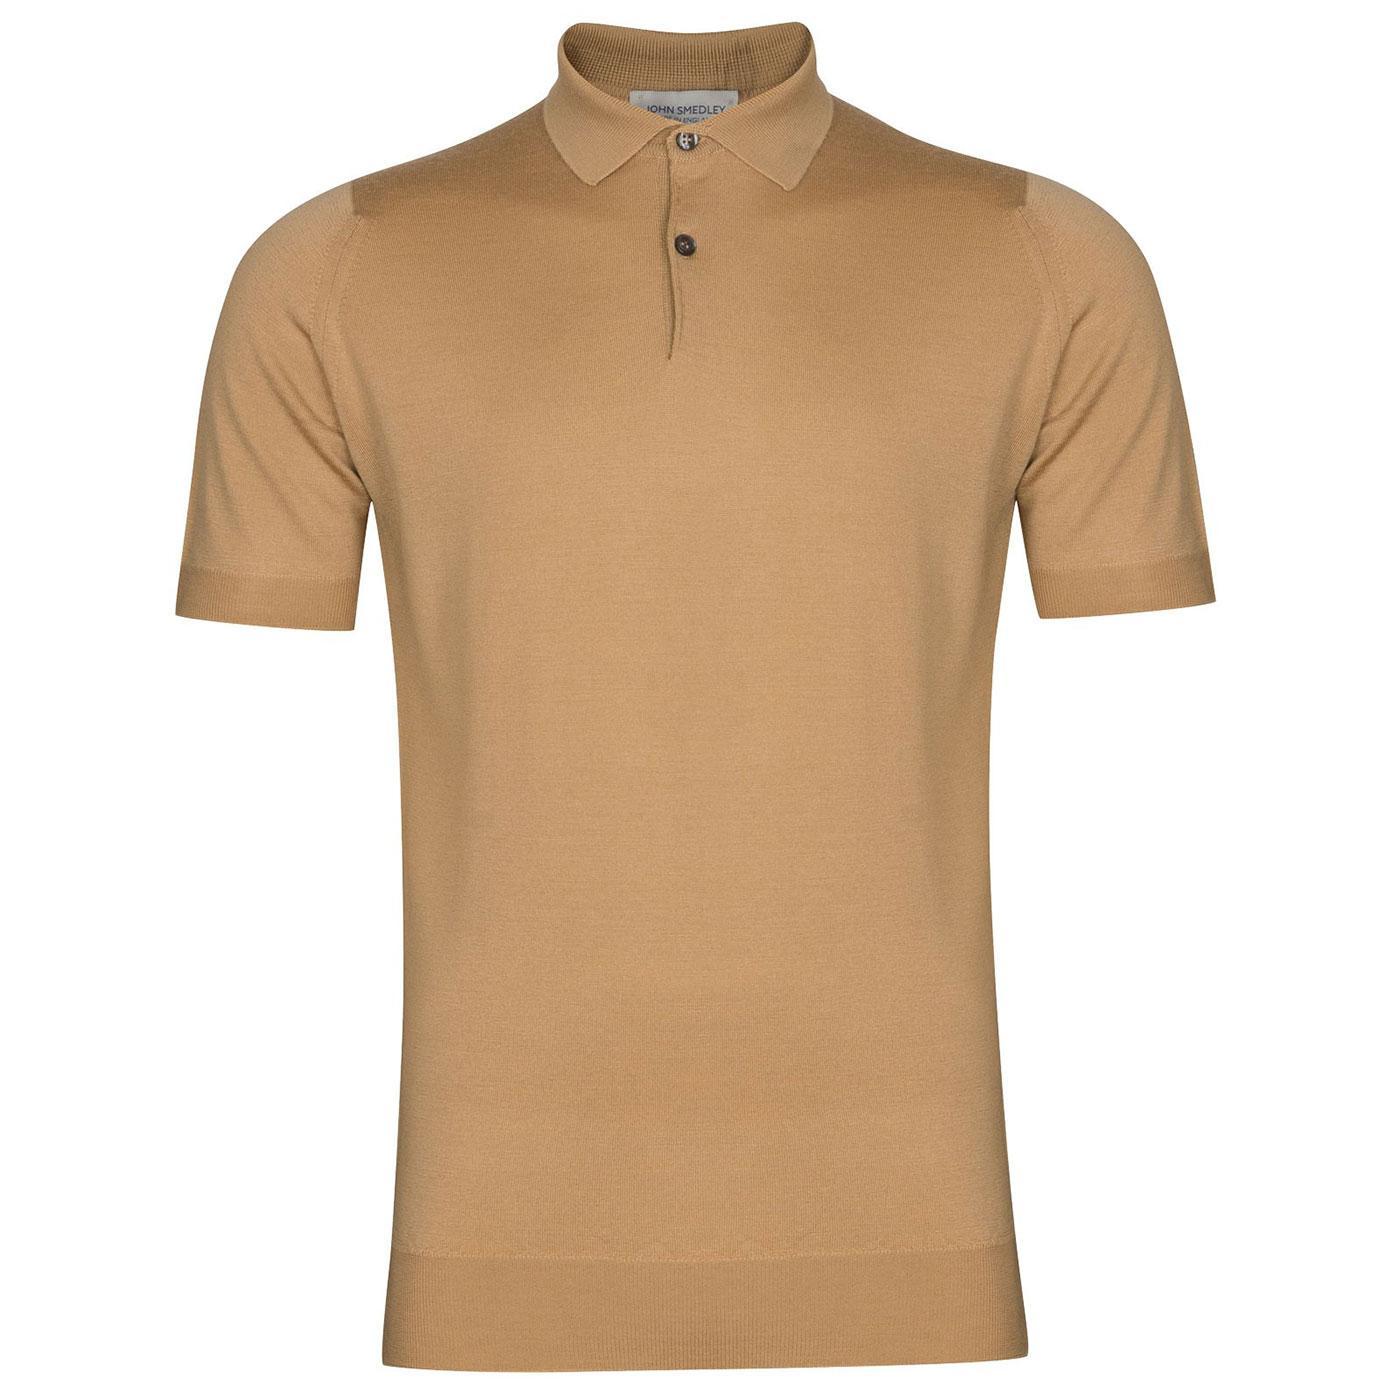 Payton JOHN SMEDLEY Knitted Merino Polo Shirt LC